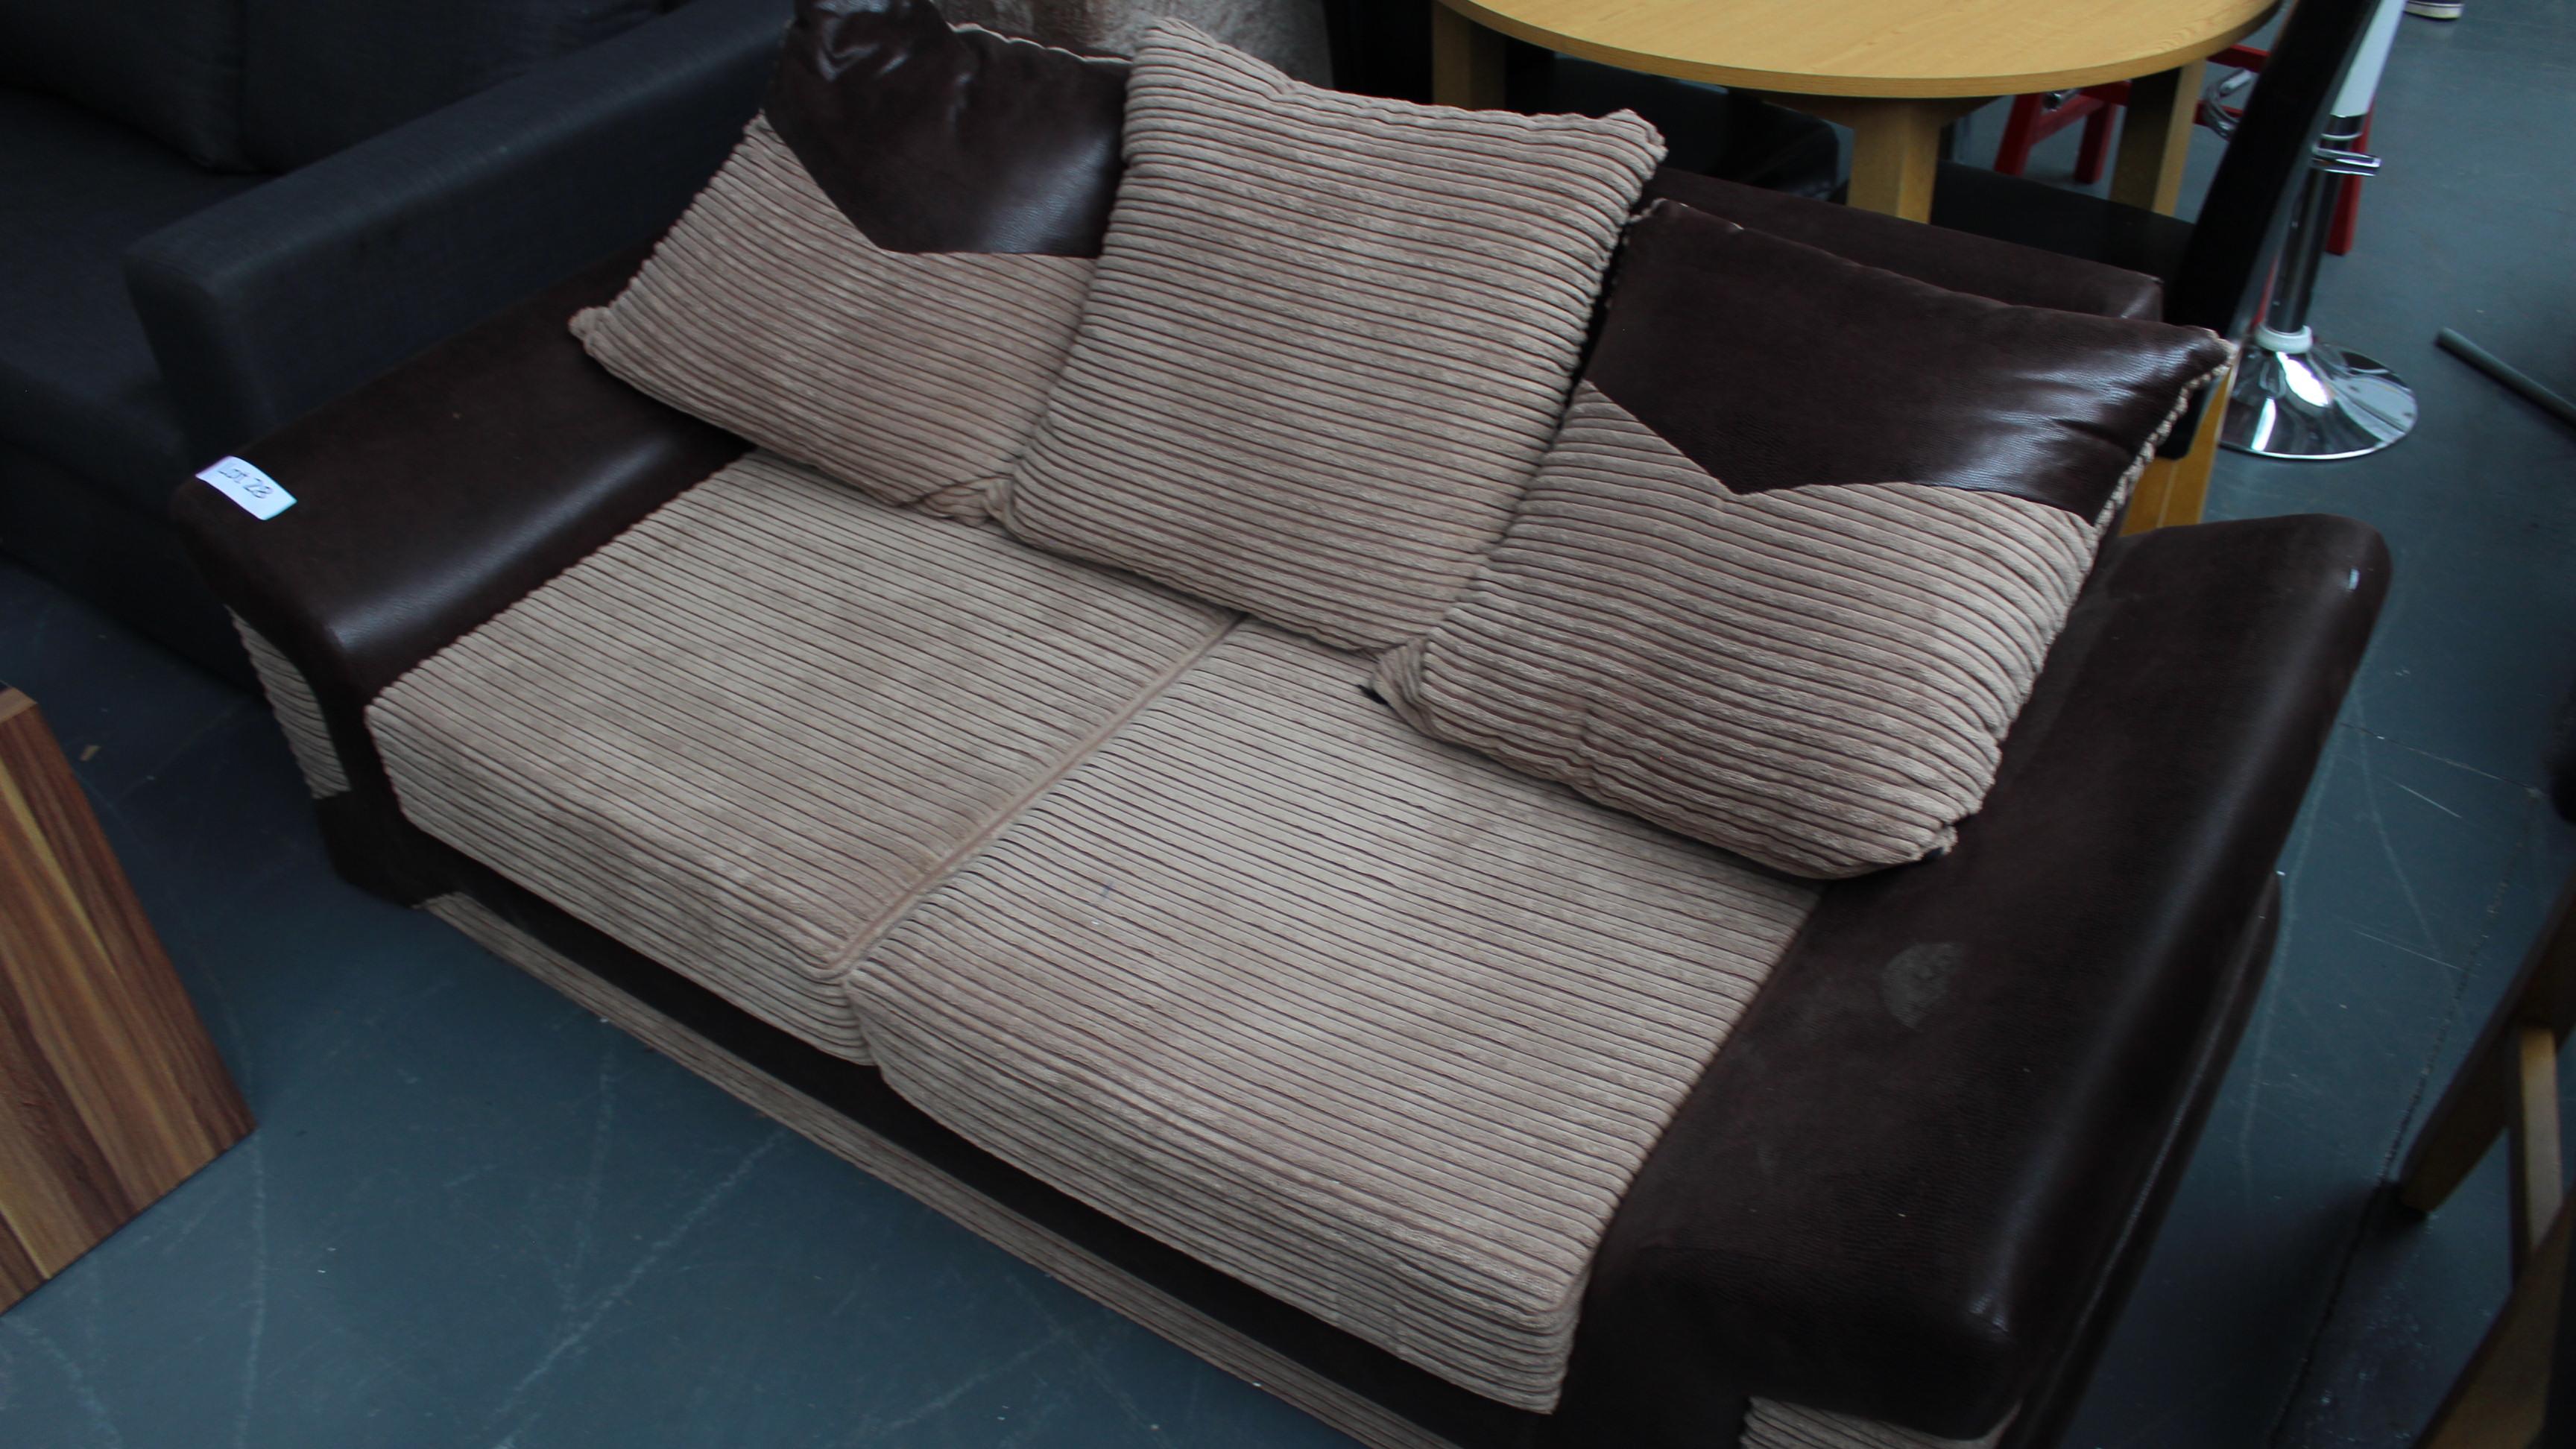 Lot 28 - 2 Seater Corded. Customer Returns